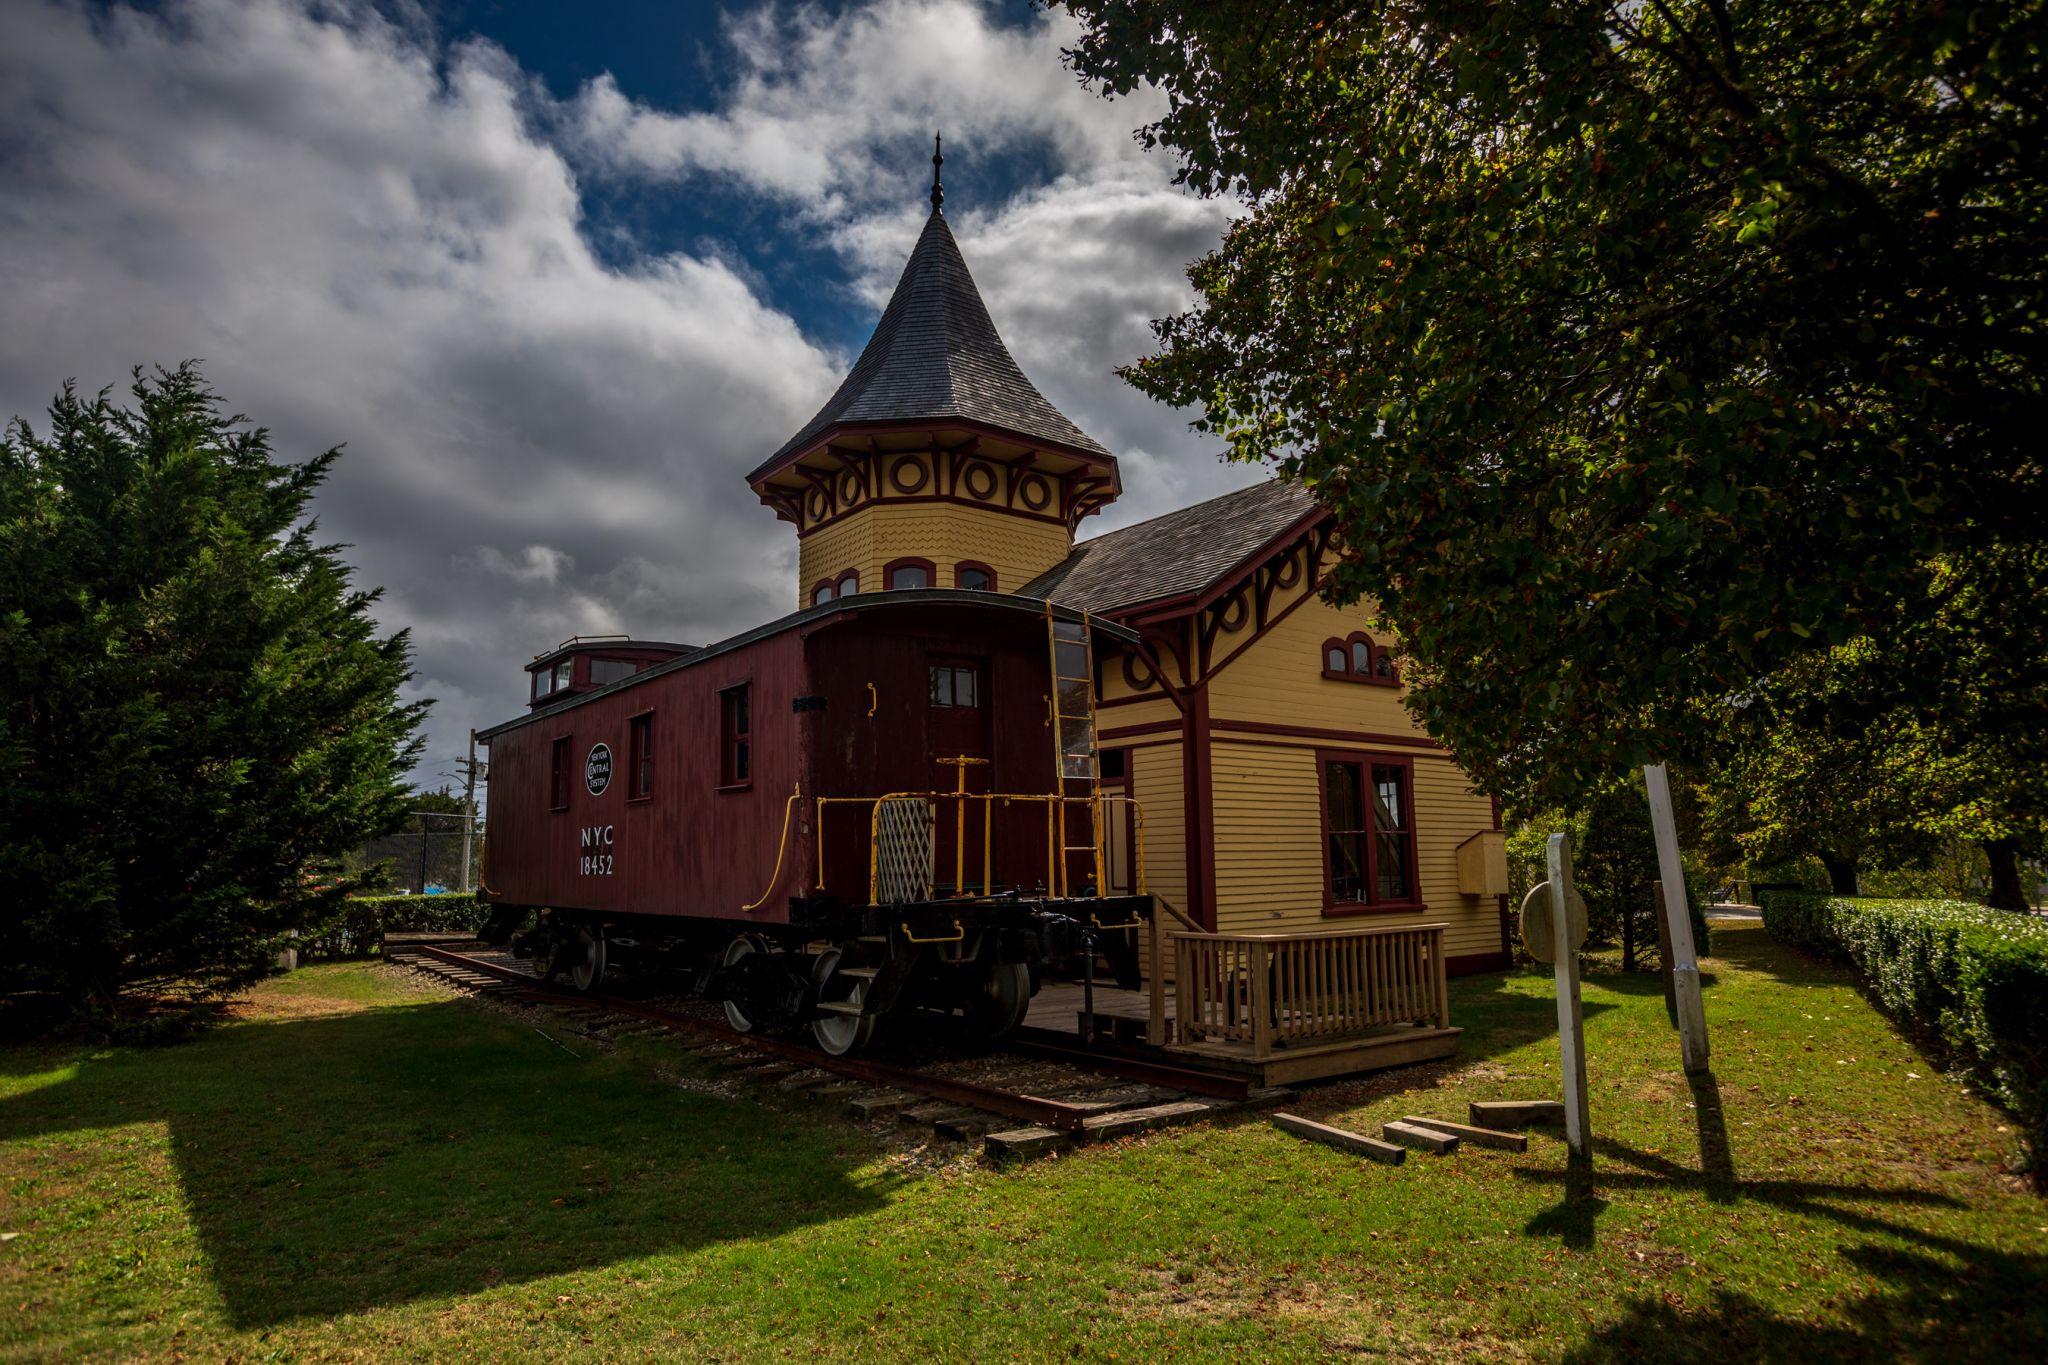 The Chatham Railroad Museum Massachusetts, USA